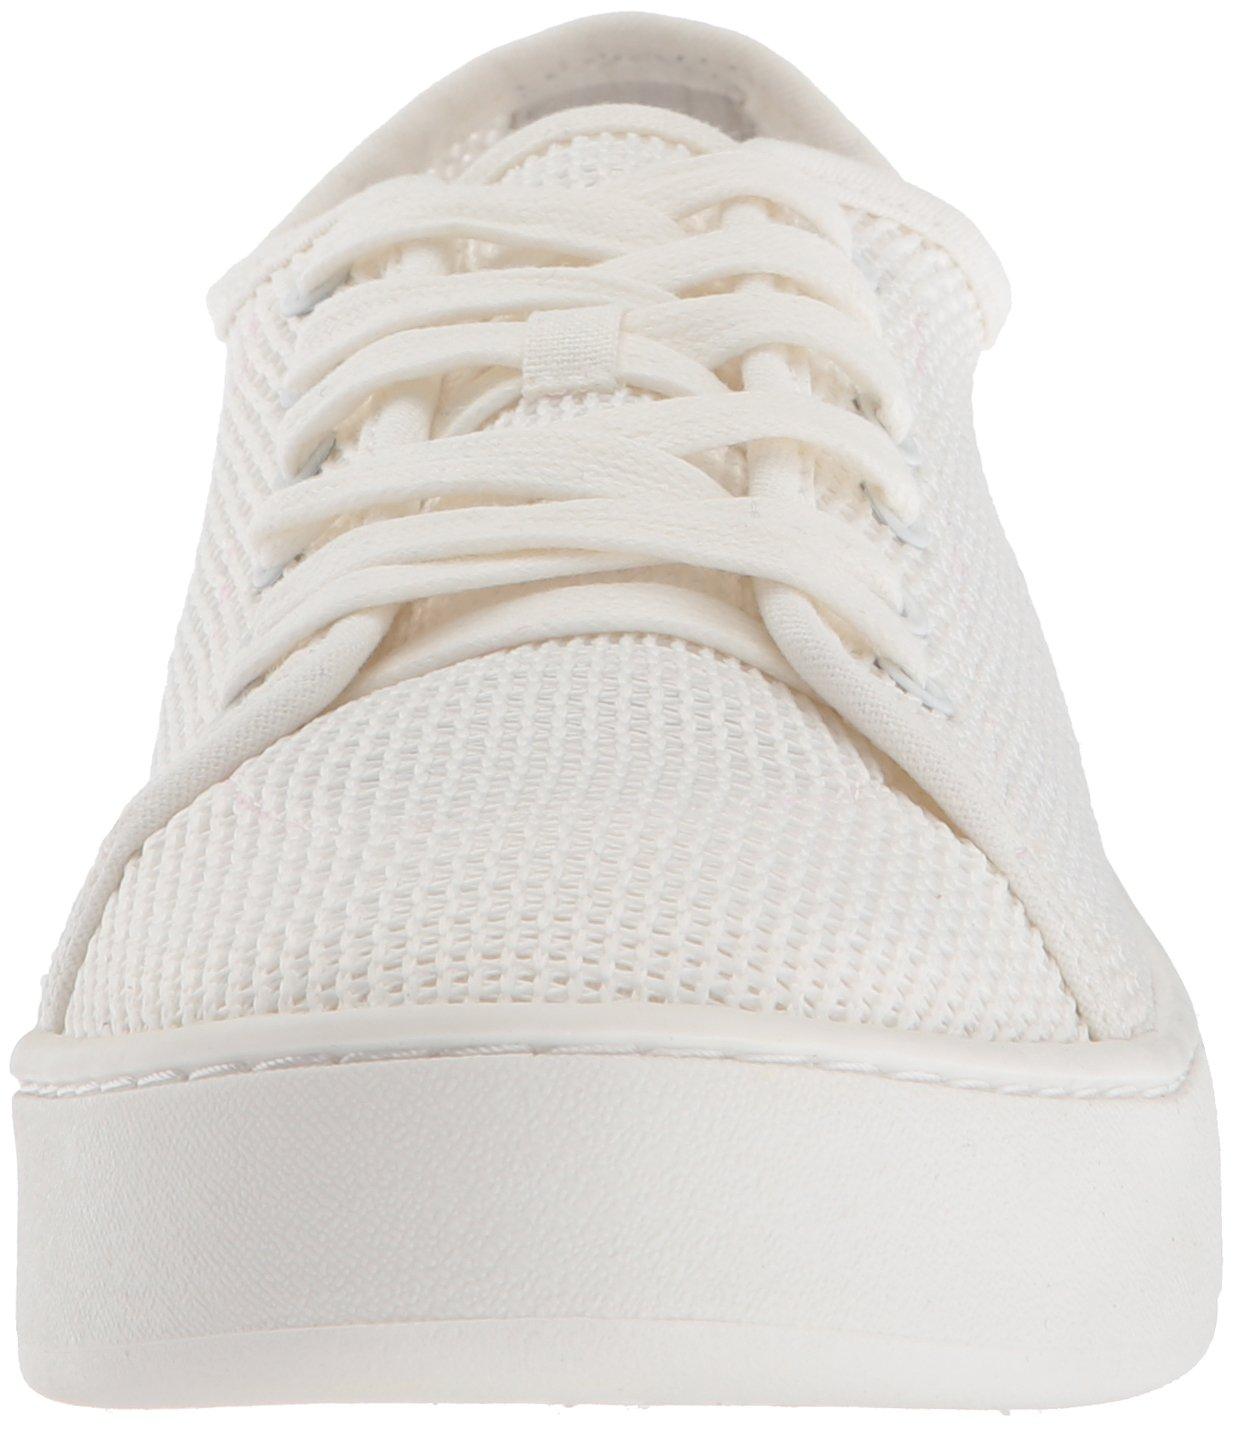 Donald J Pliner Women's Cecile US|Bone Sneaker B0755BCJ5C 8 B(M) US|Bone Cecile c1ab9f